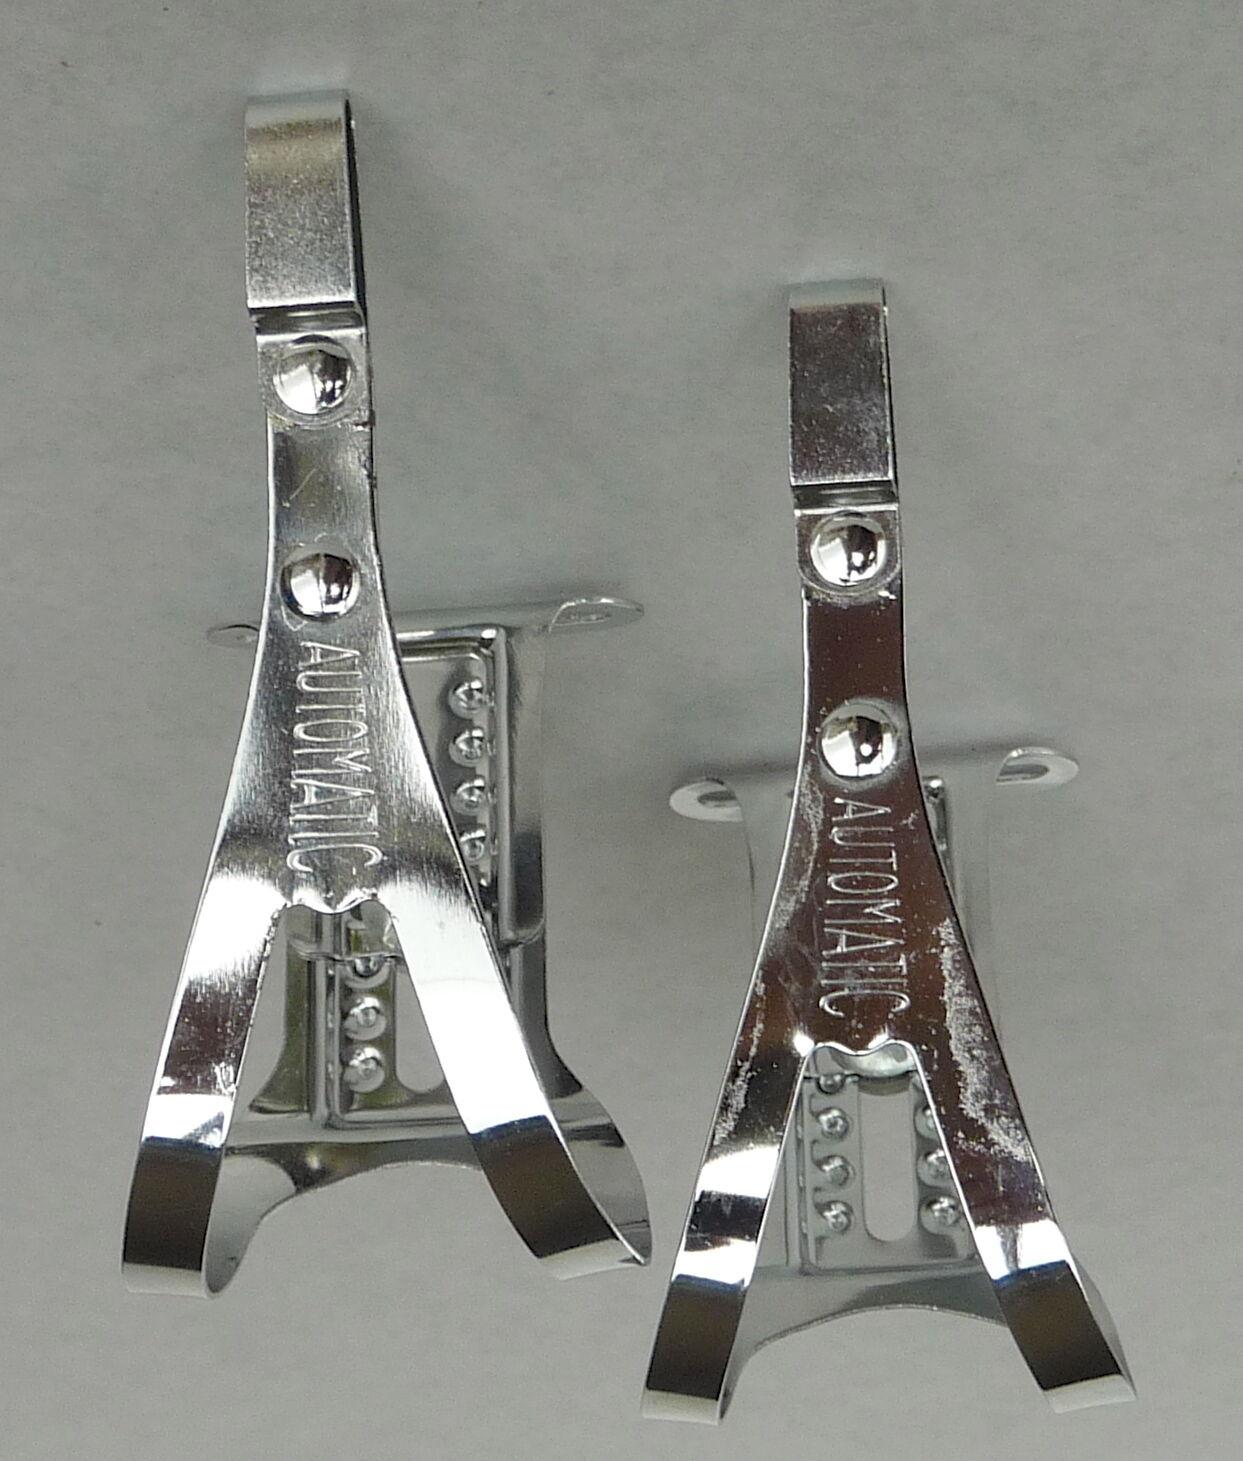 Paturaud Toe Clips for Herse Adjustable Vintage Bke Randonneur for  Singer NOS  perfect